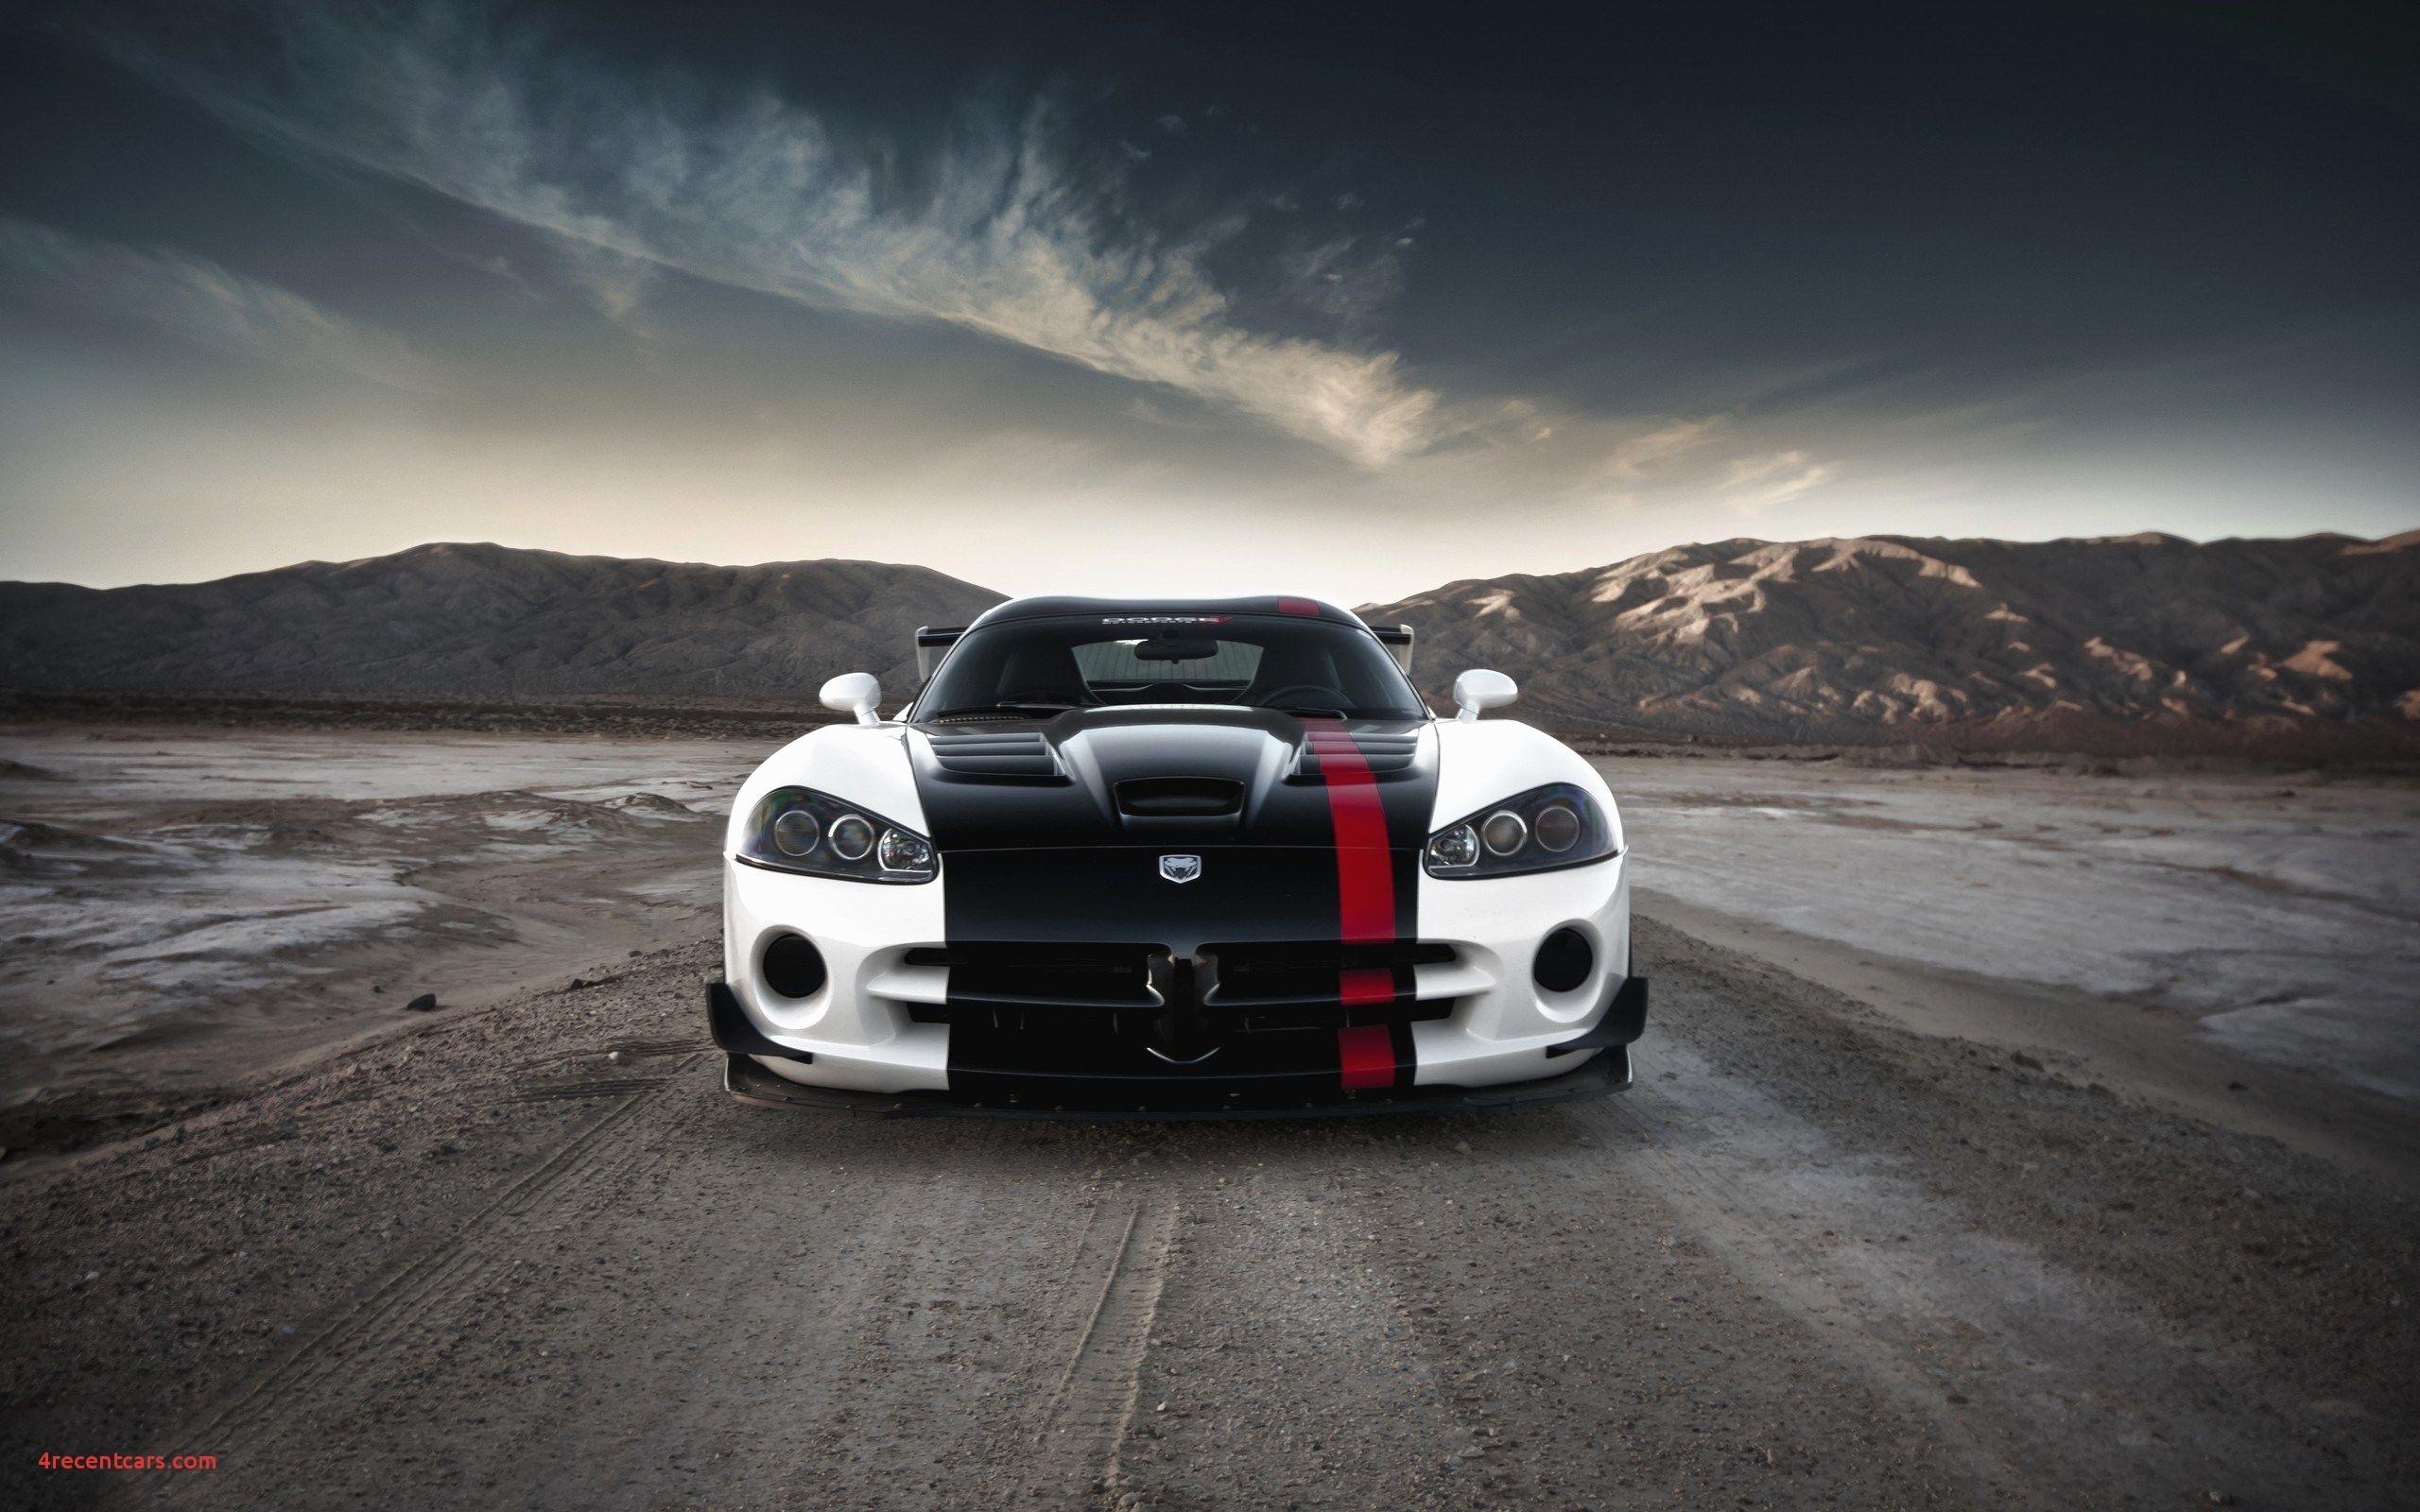 car wallpaper high resolution - staruptalent -